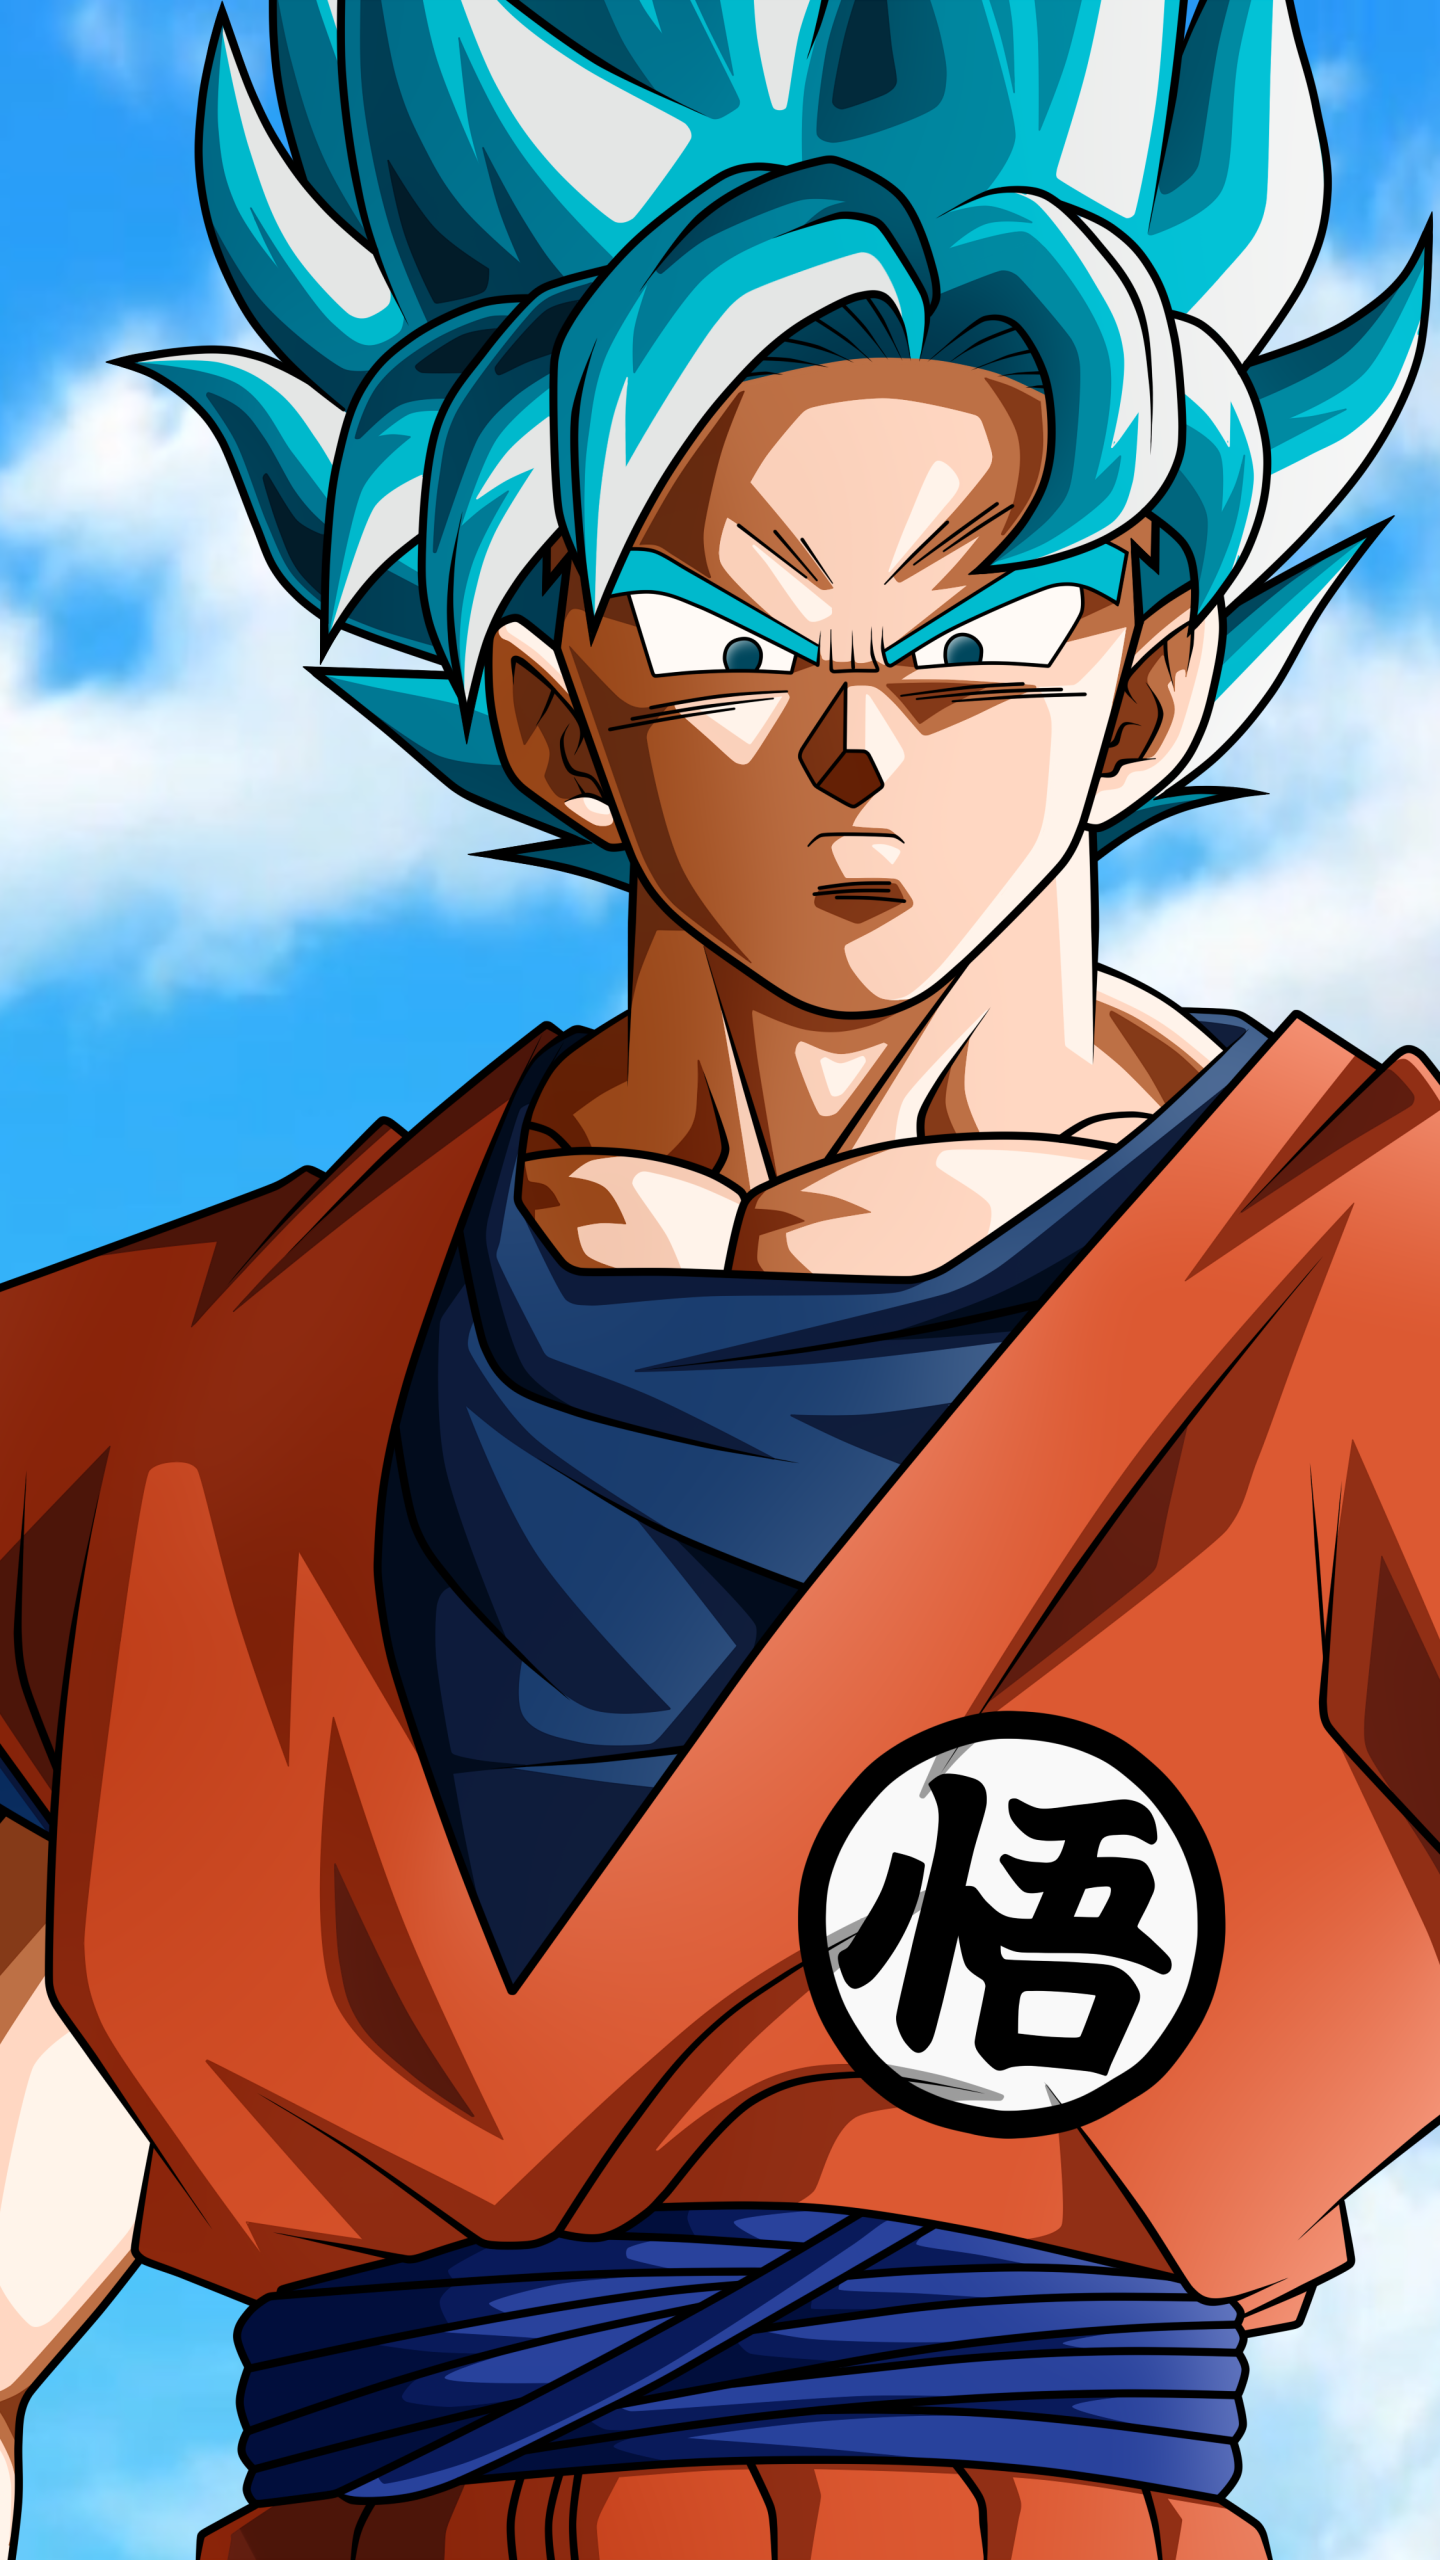 Resultado de imagen para iphone dragon ball super Goku